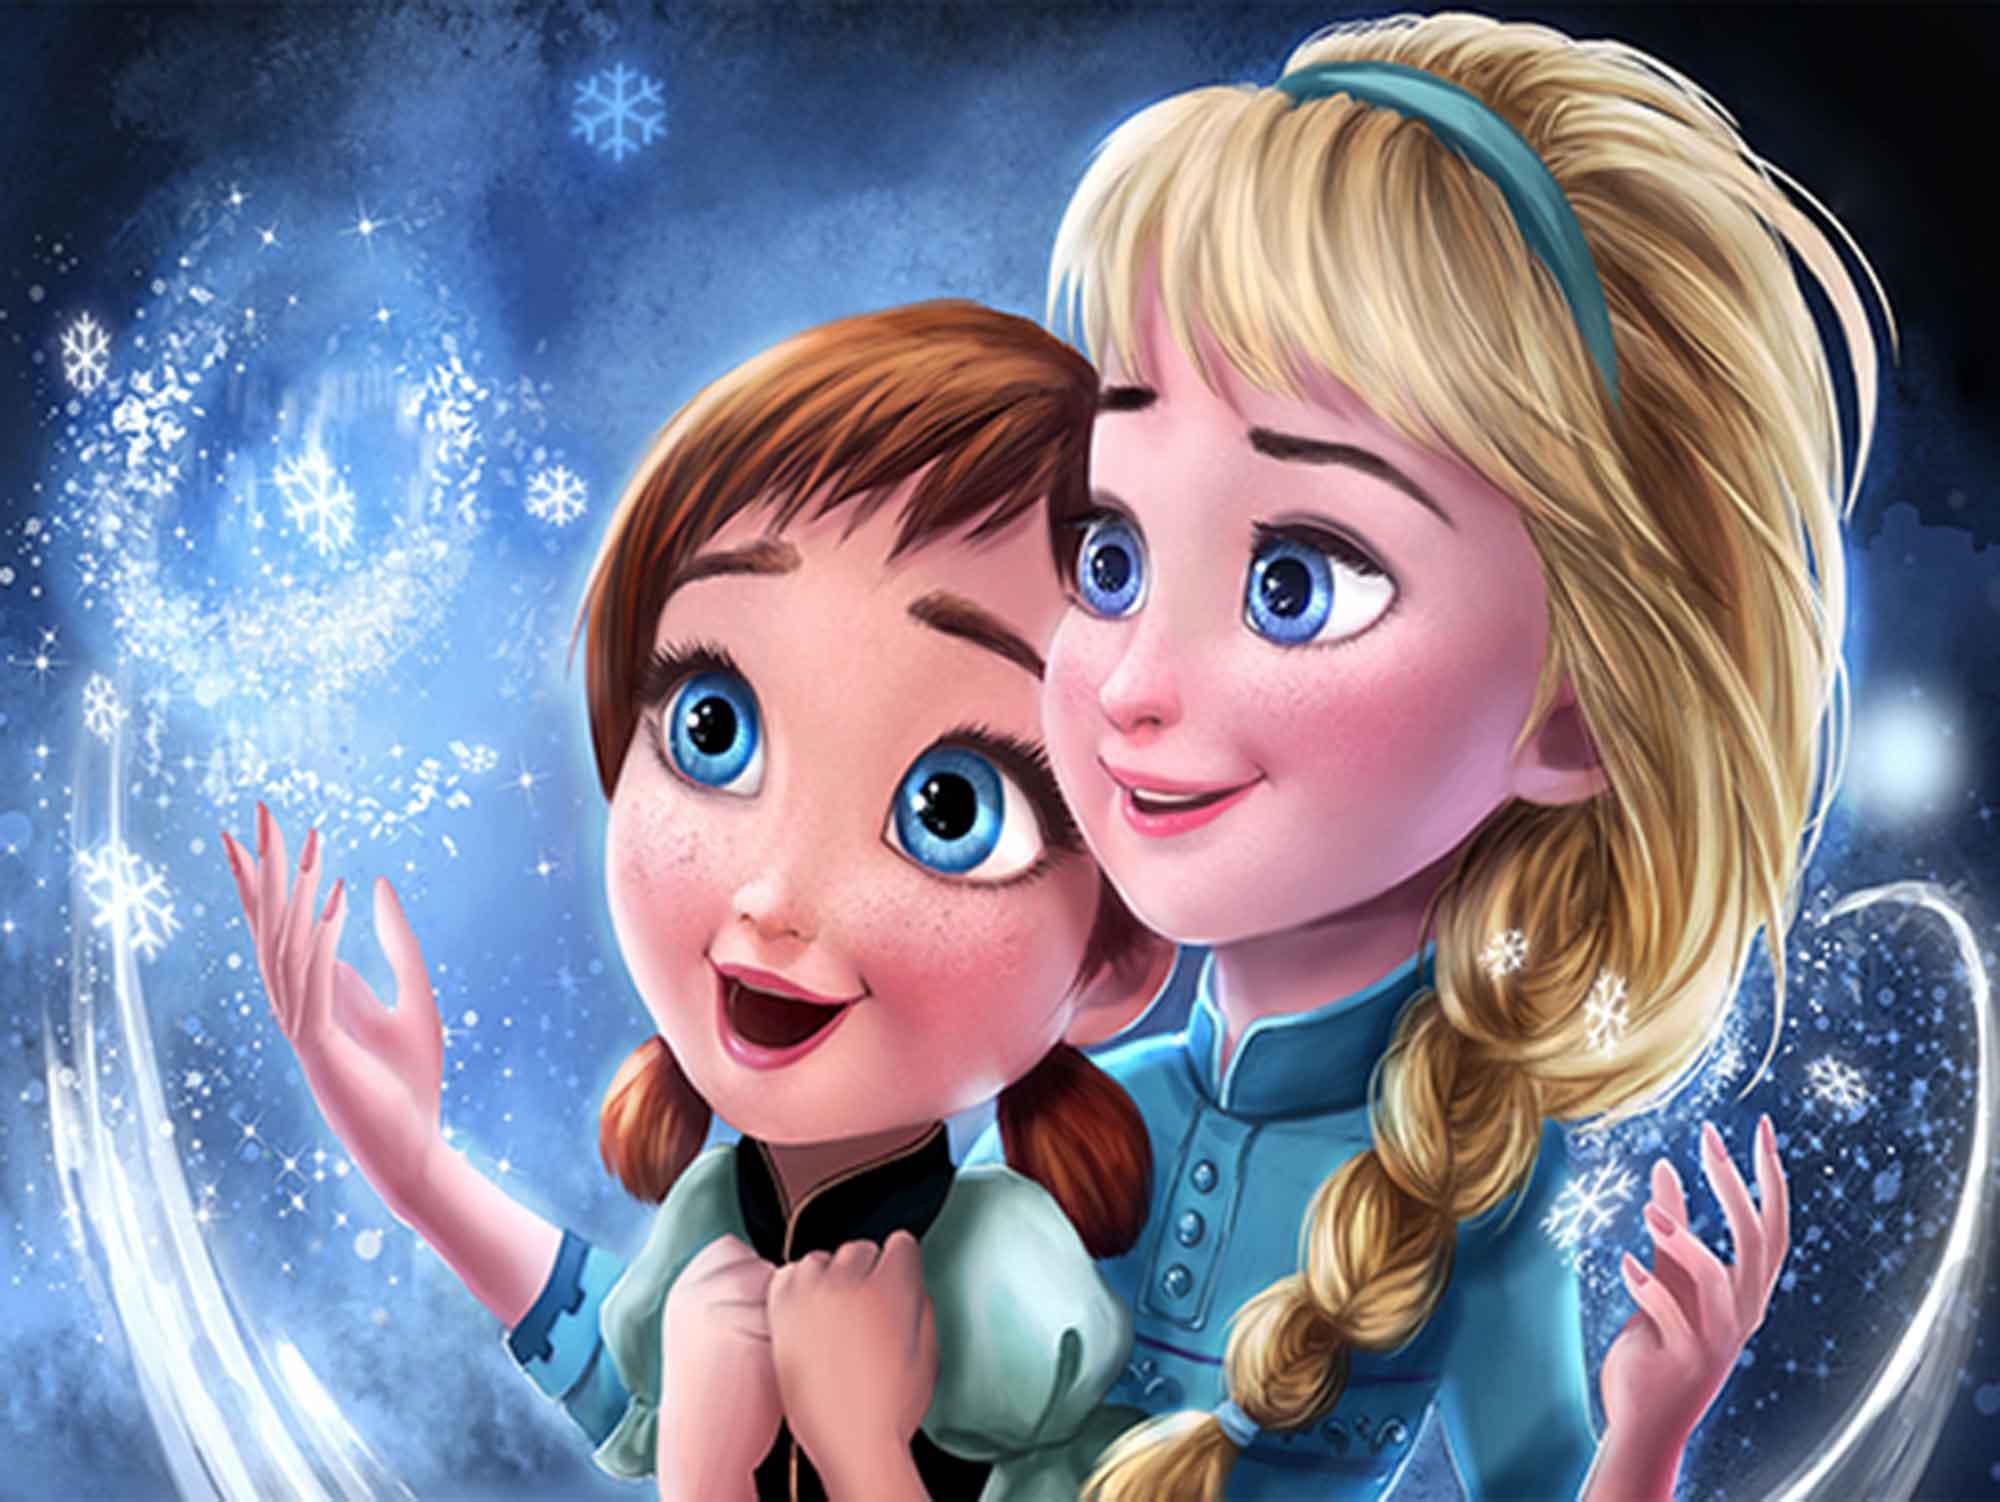 Papel de Parede Infantil Frozen 0005 - Papel de Parede para Quarto  - Paredes Decoradas